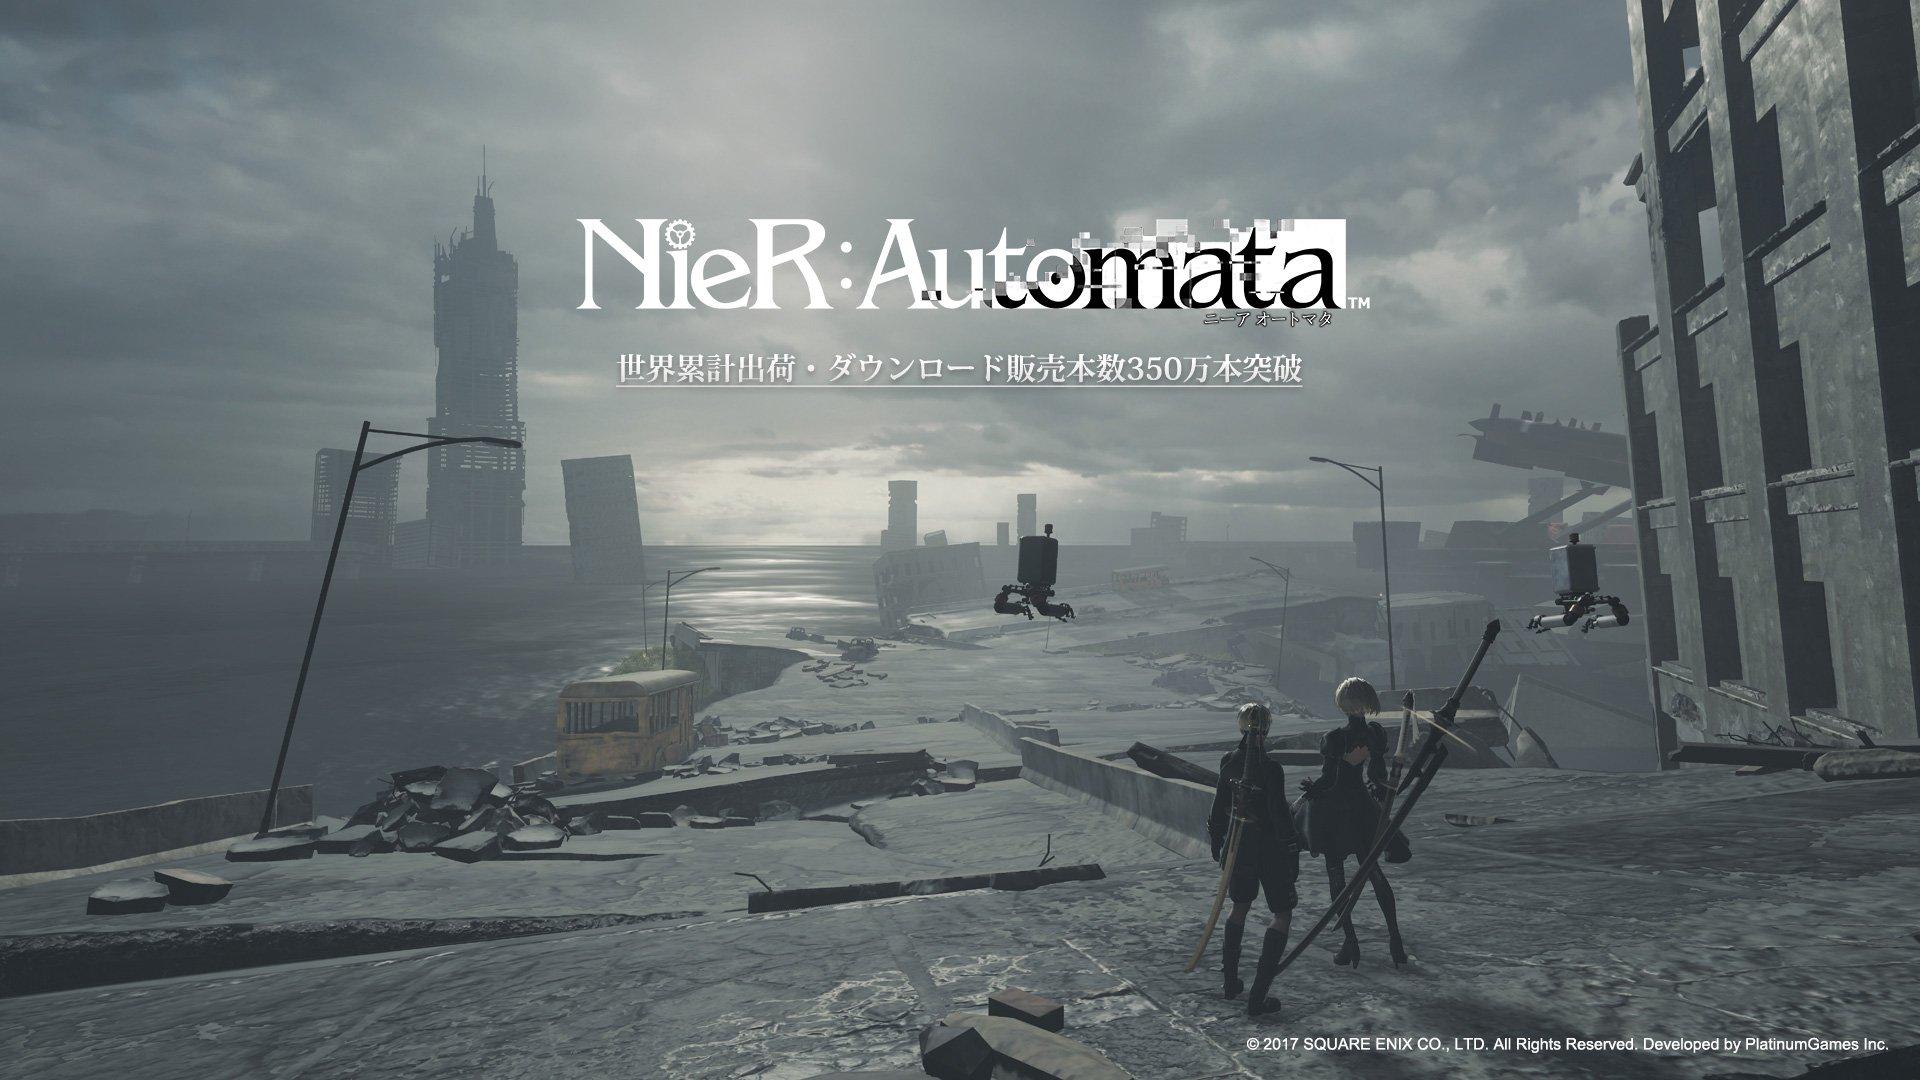 NieR-Automata-Sales_12-04-18.jpg